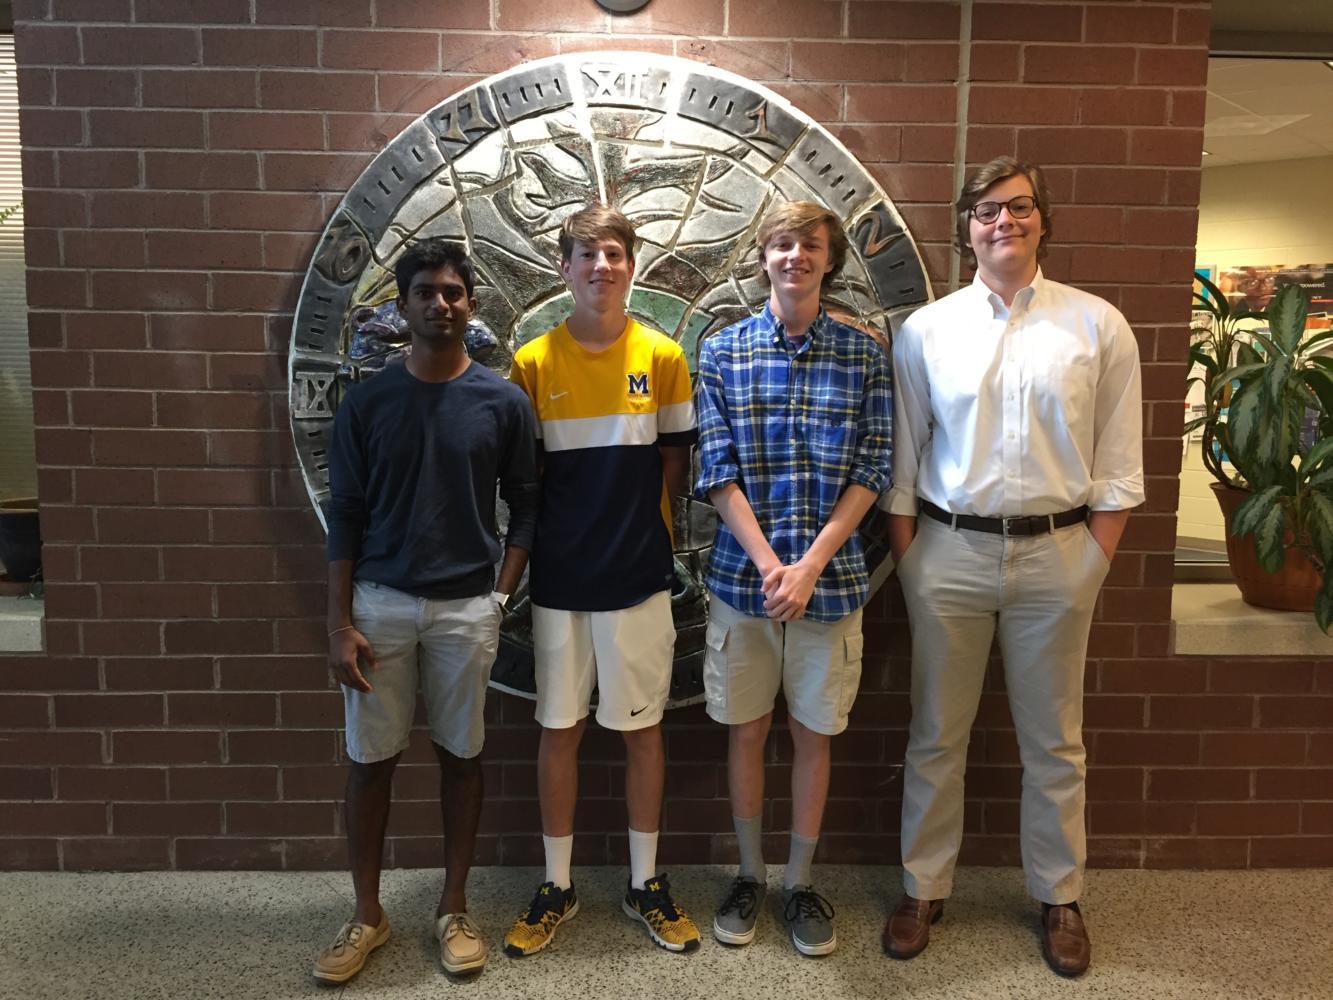 Virginia Boys State Delegates: Left to right:  Sai Poluri, Finlay Raphael, Andrew Baldacci, Ben Sultzer  (Not pictured:  Jinwoo Kim)